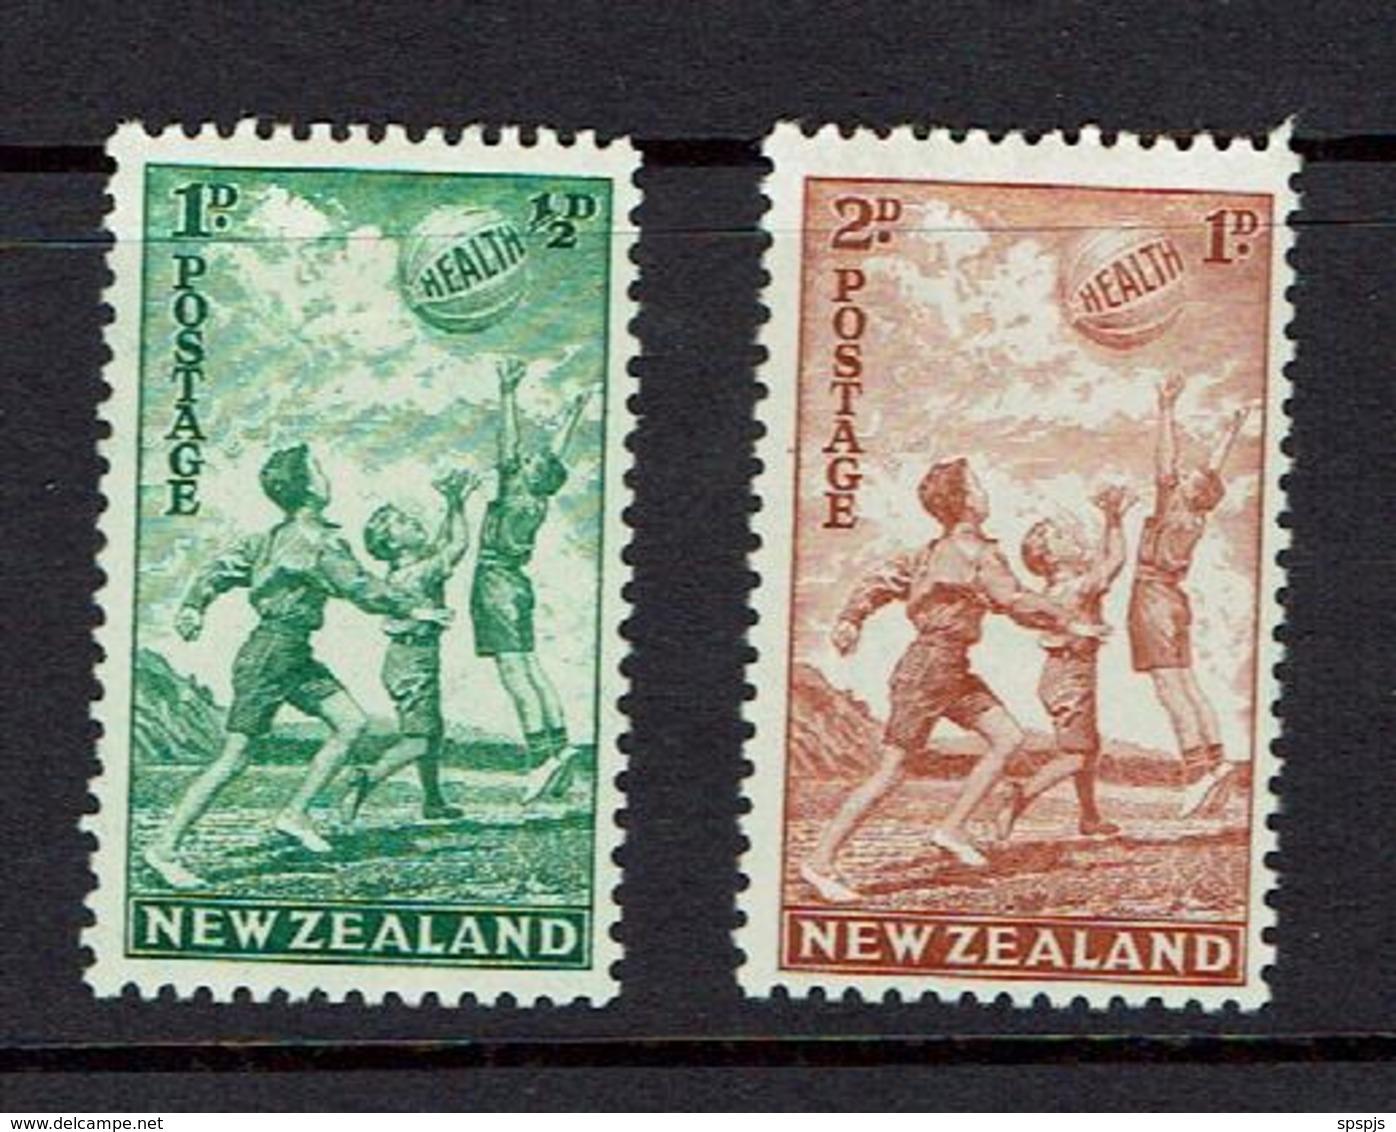 NEW ZEALAND..1940...mh - Unused Stamps